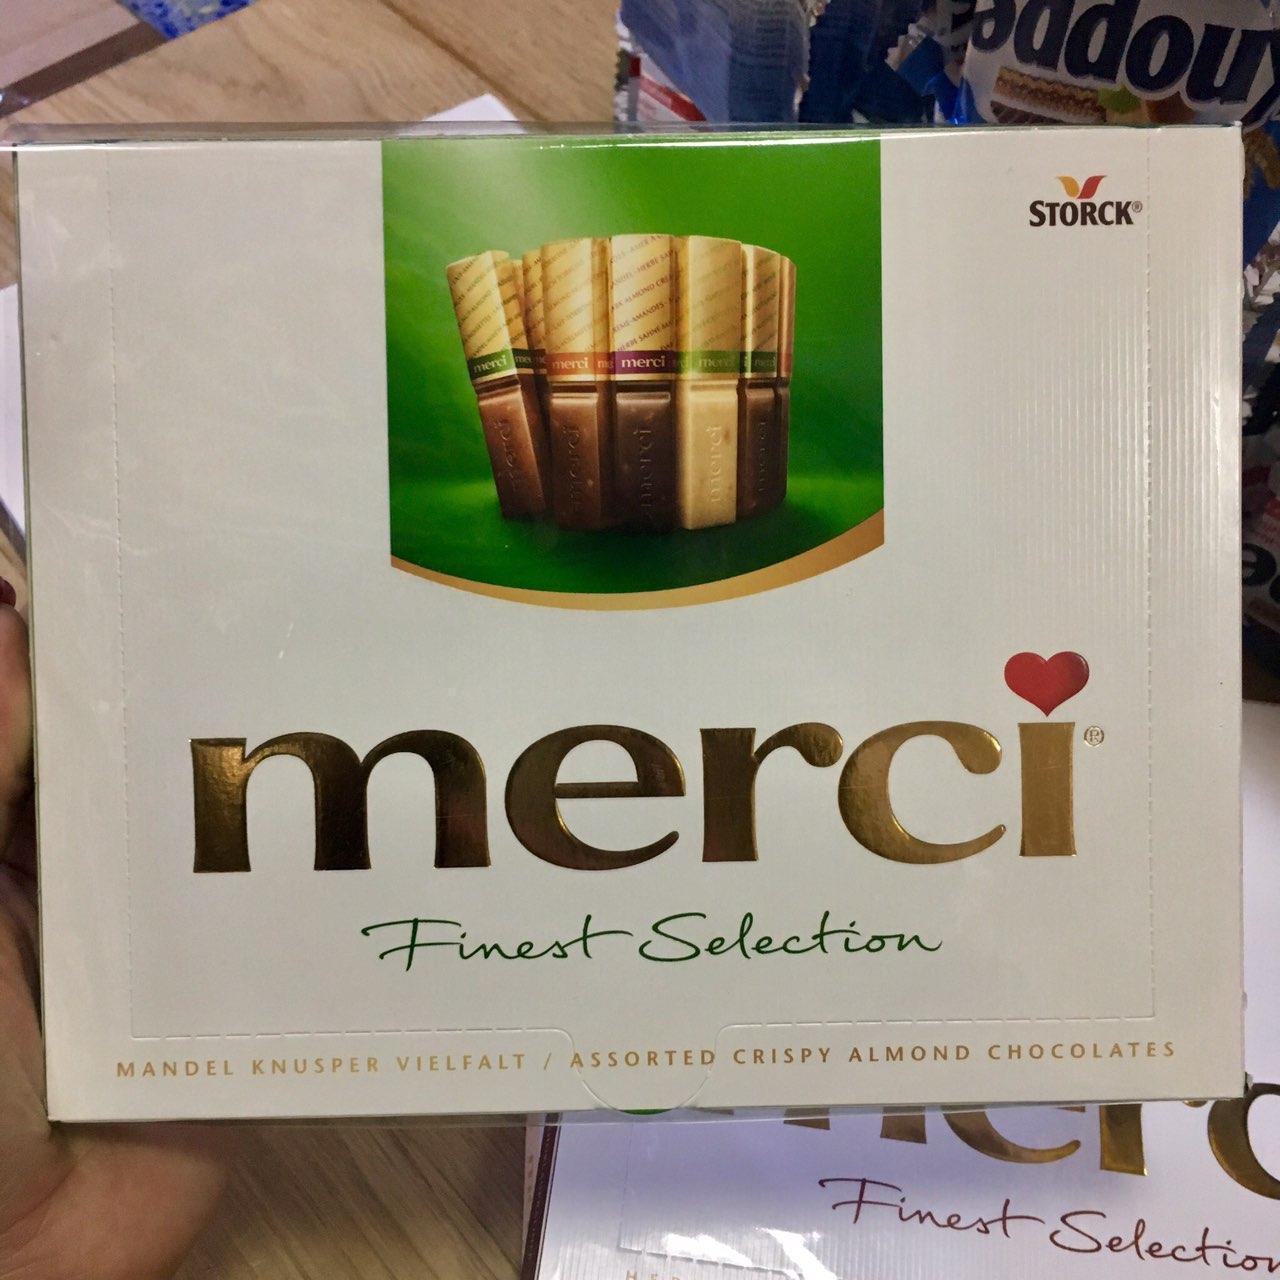 Конфеты Merci Crispy Almond Chocolates 250 g